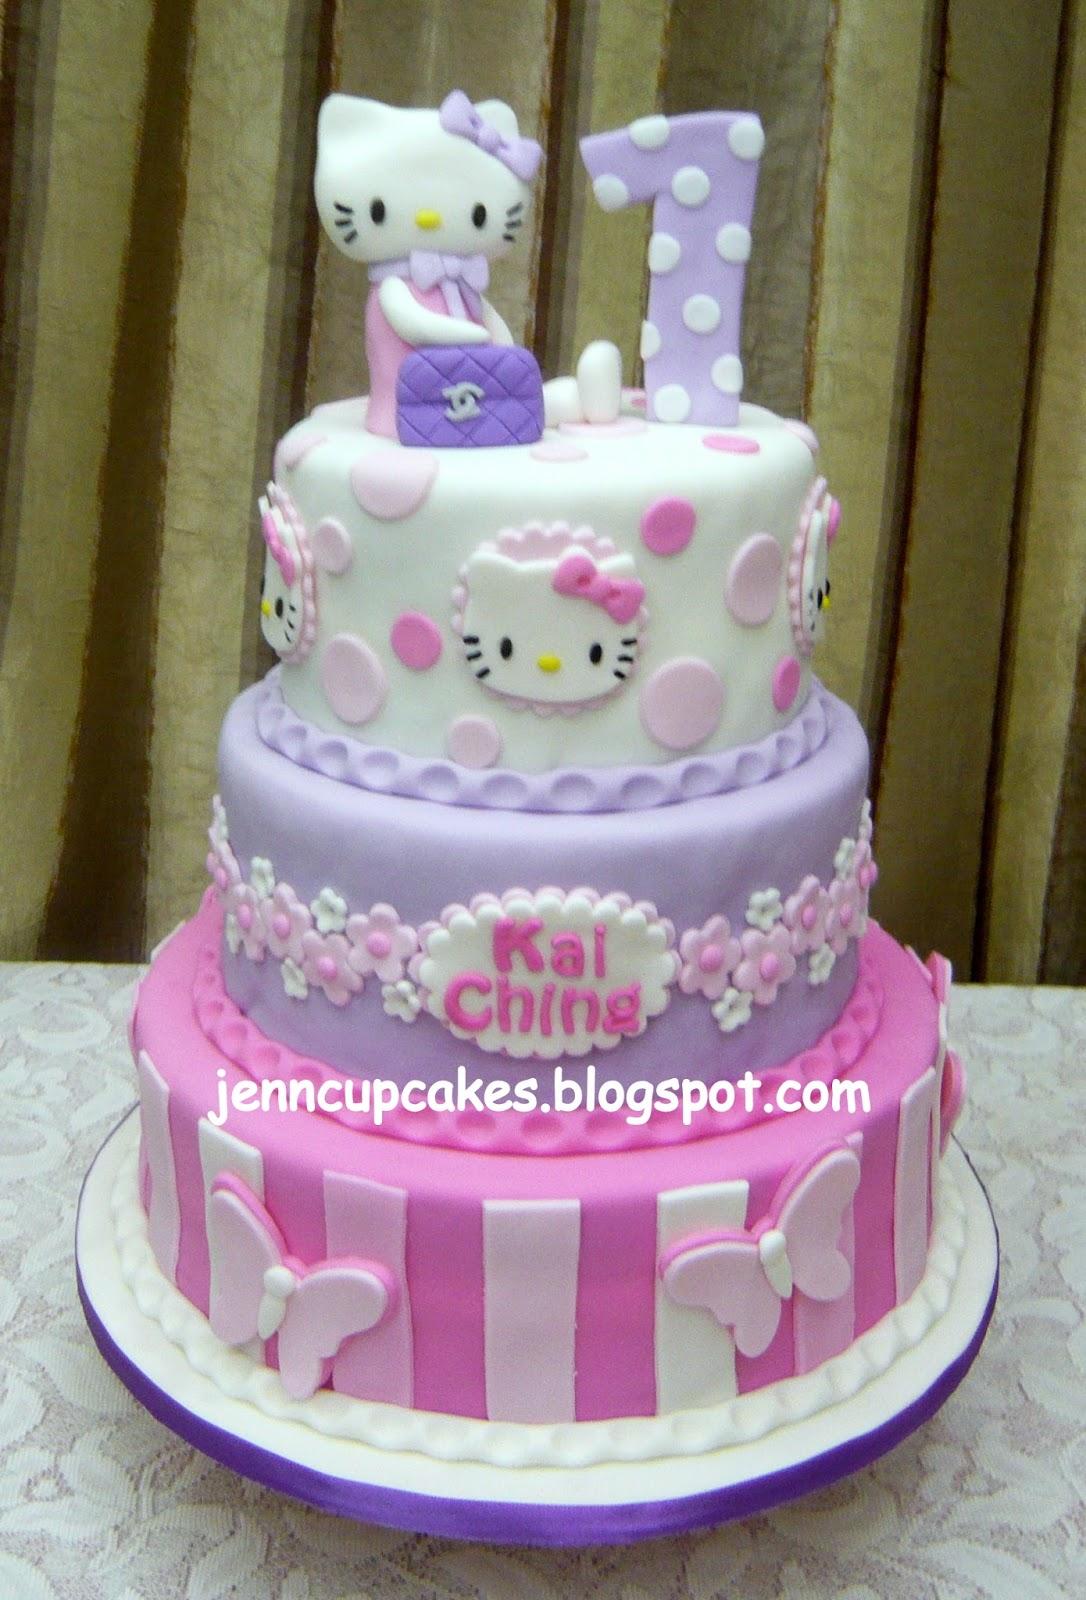 Jenn Cupcakes Muffins 3tier Hello Kitty Theme Cake